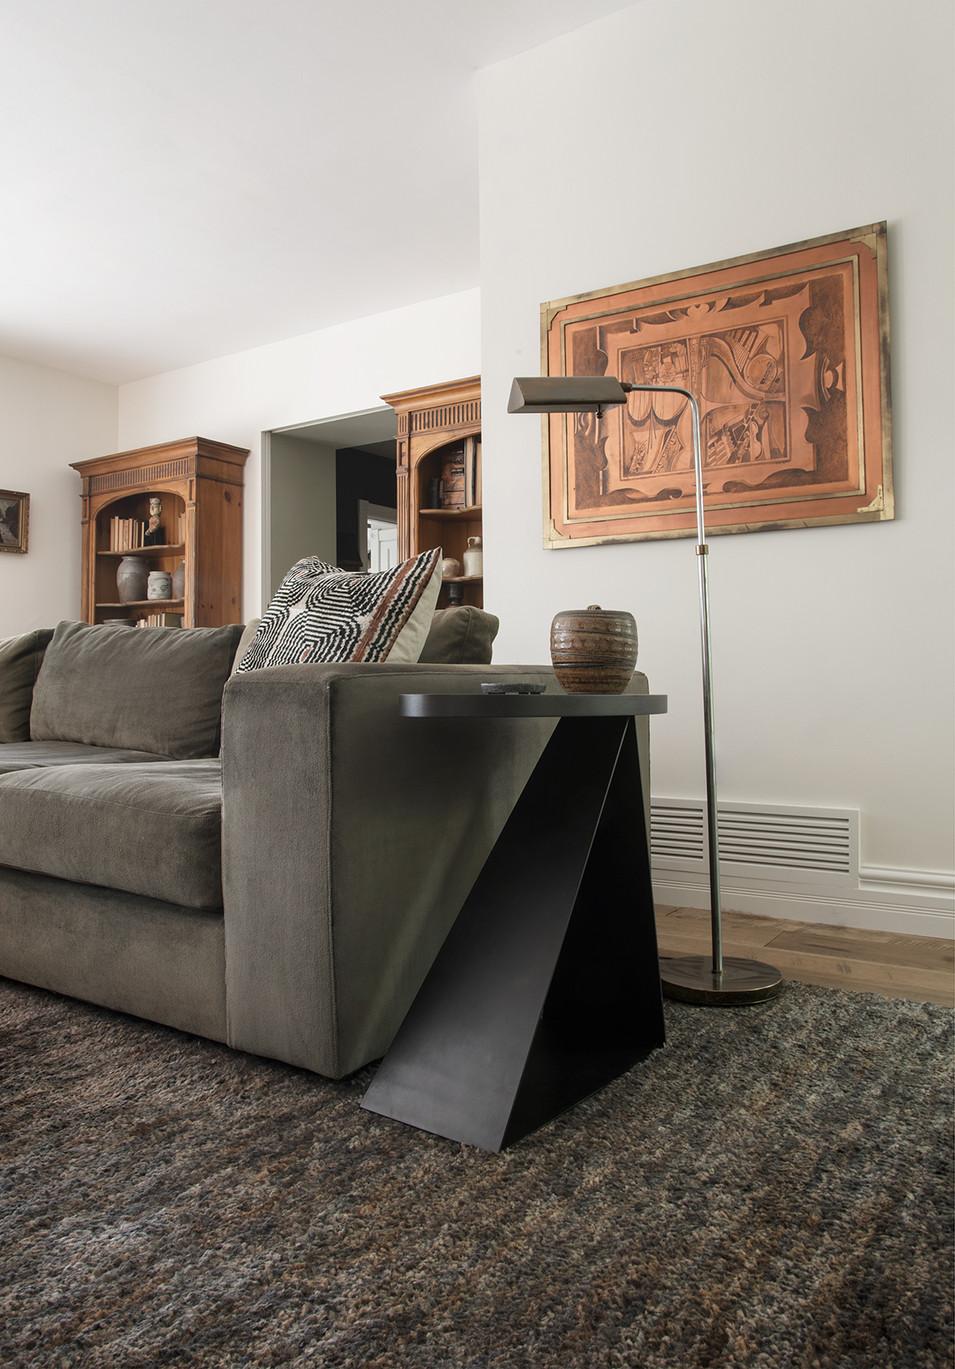 Kelly-Martin-Interiors-ATELIERxKM-Side-table-Custom-Furniture